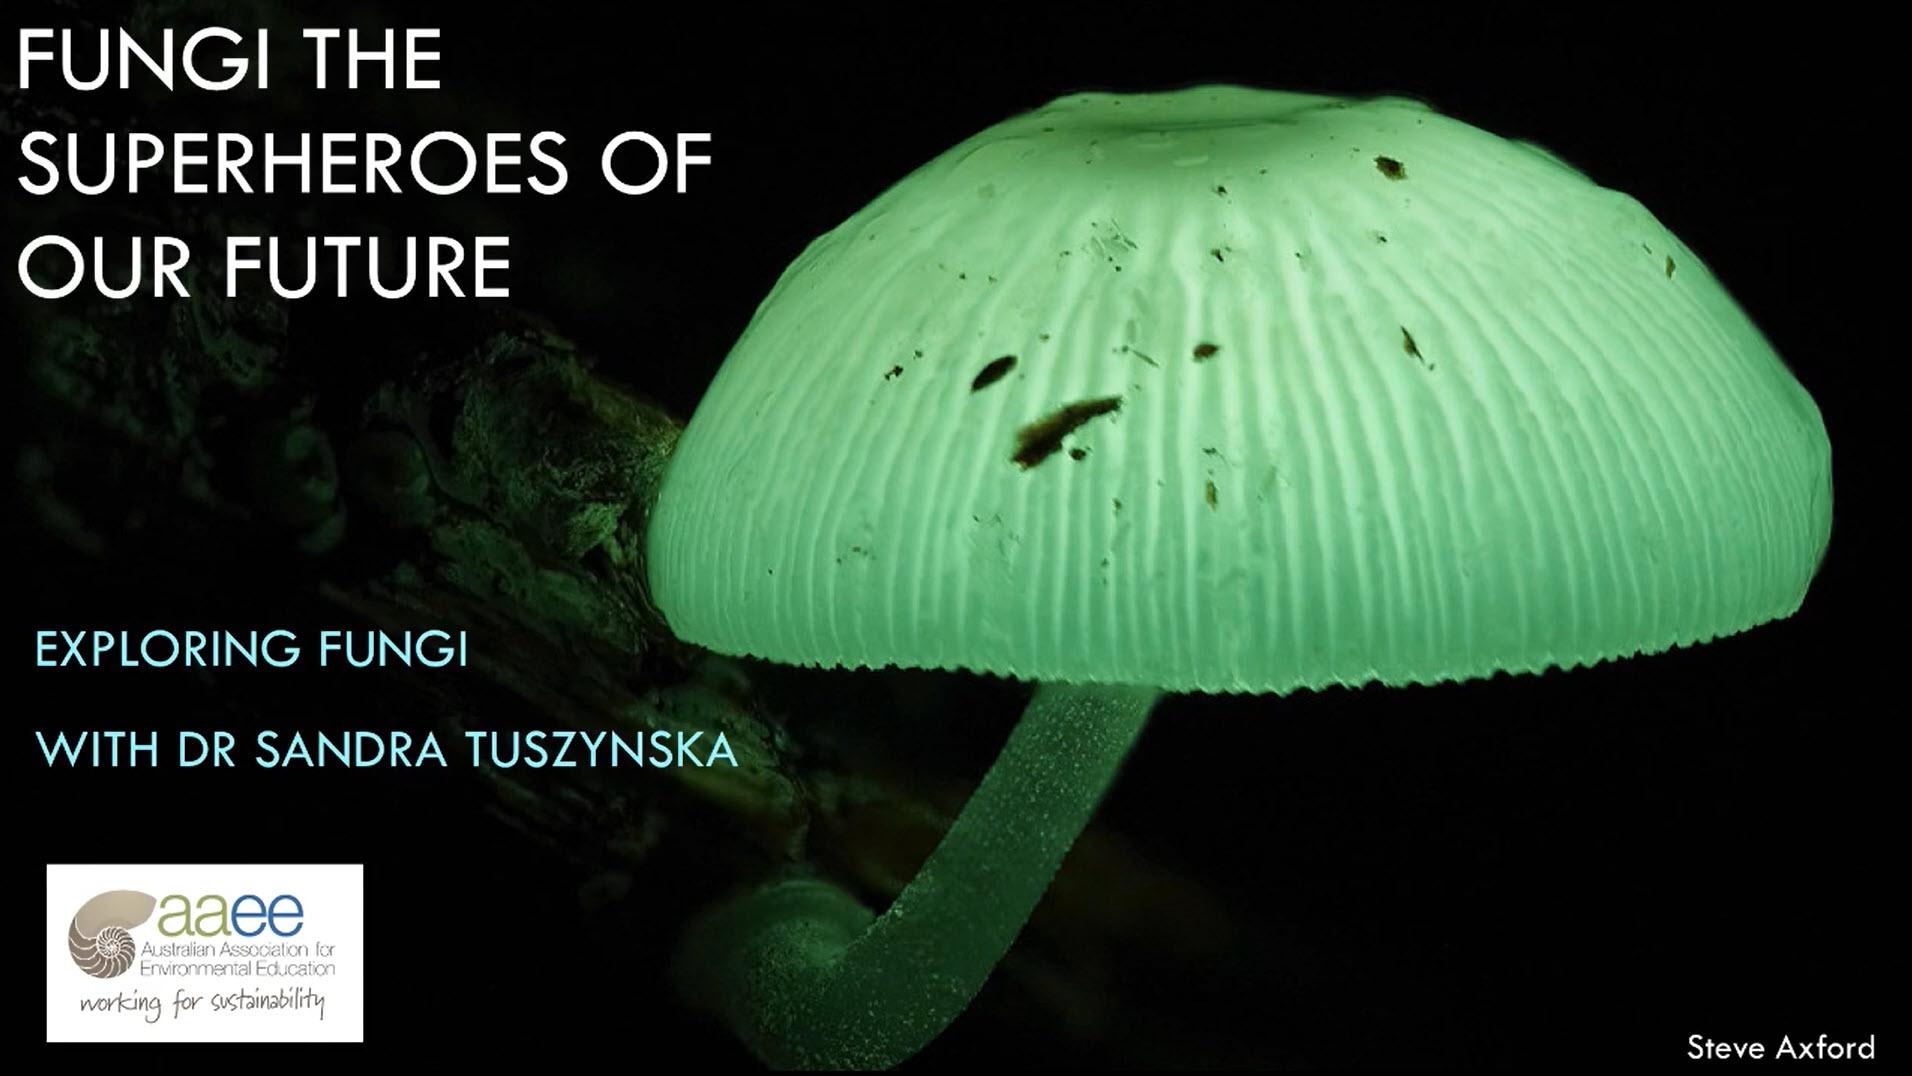 Fungi superheroes